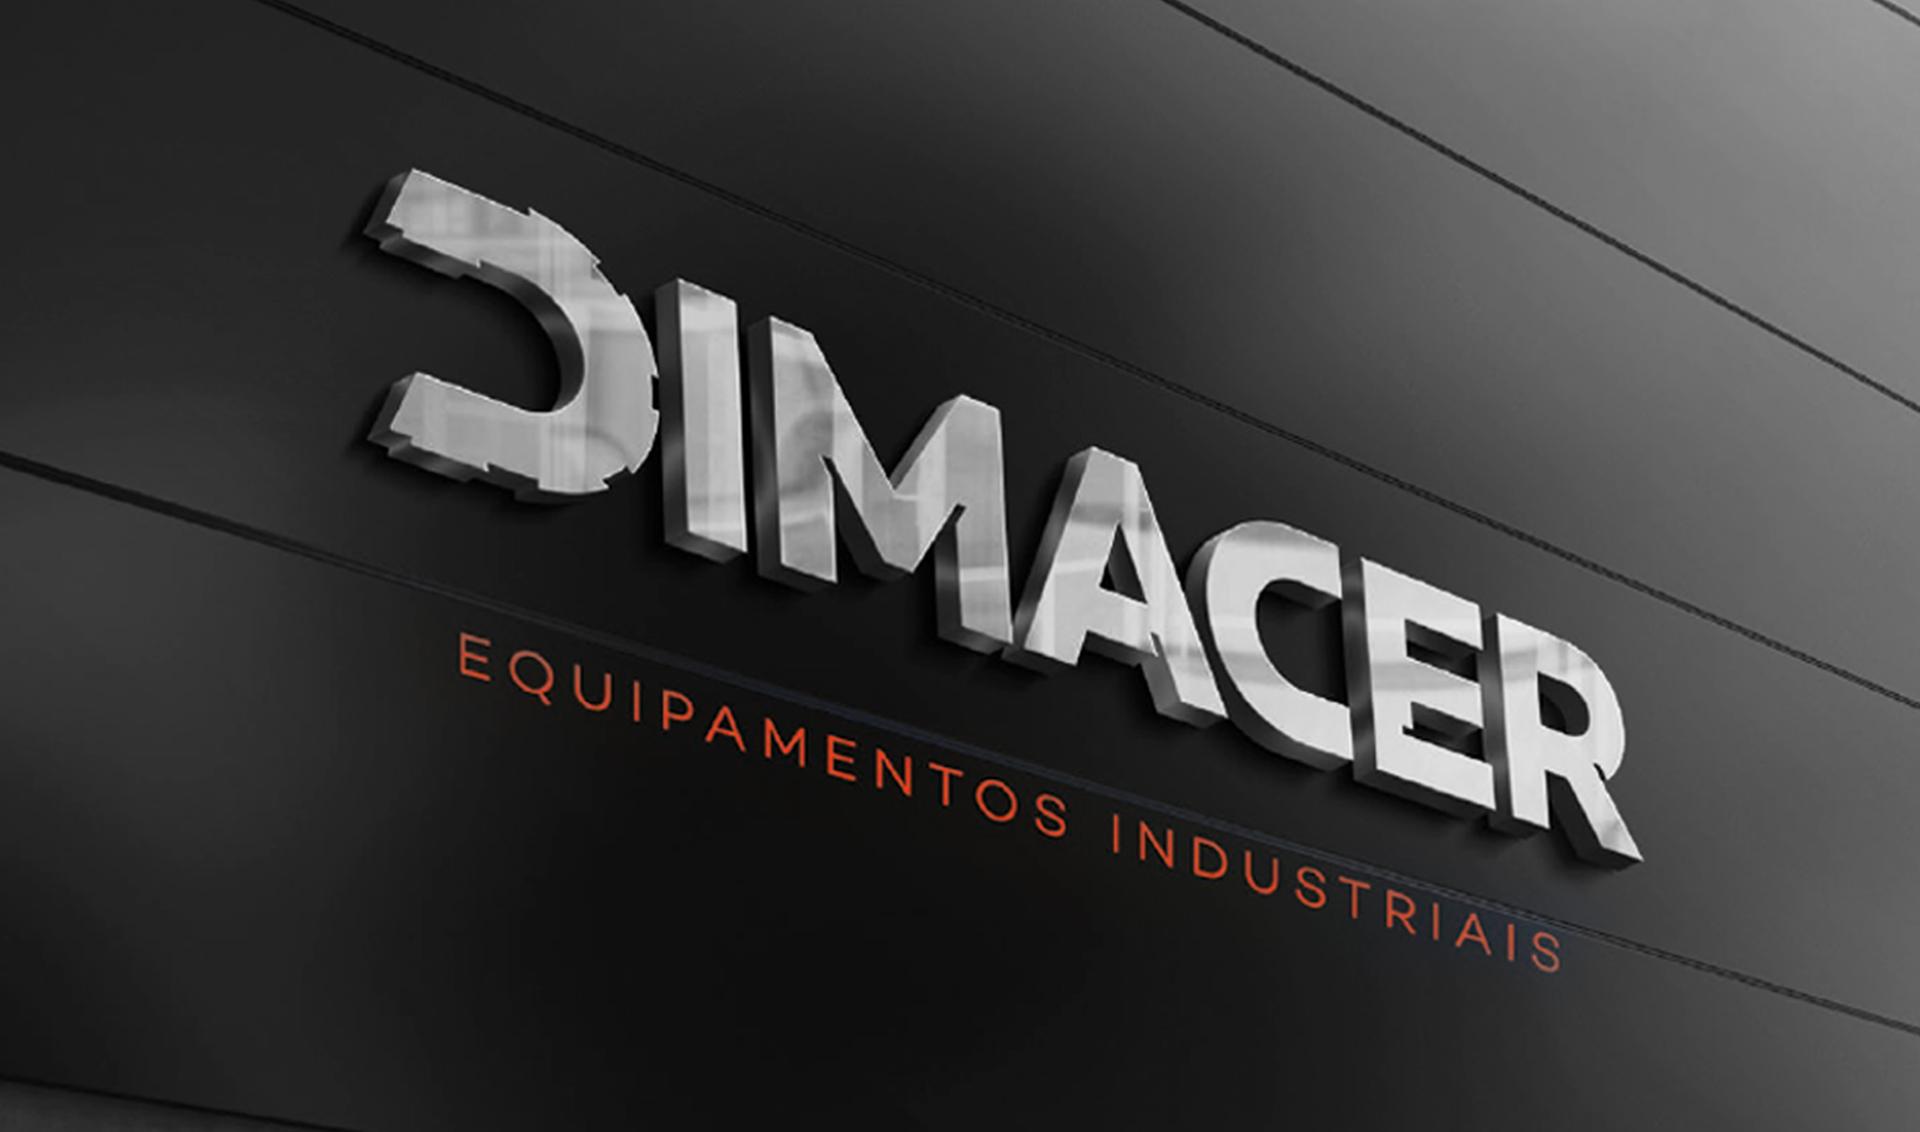 Branding Dimacer equipamentos industriais